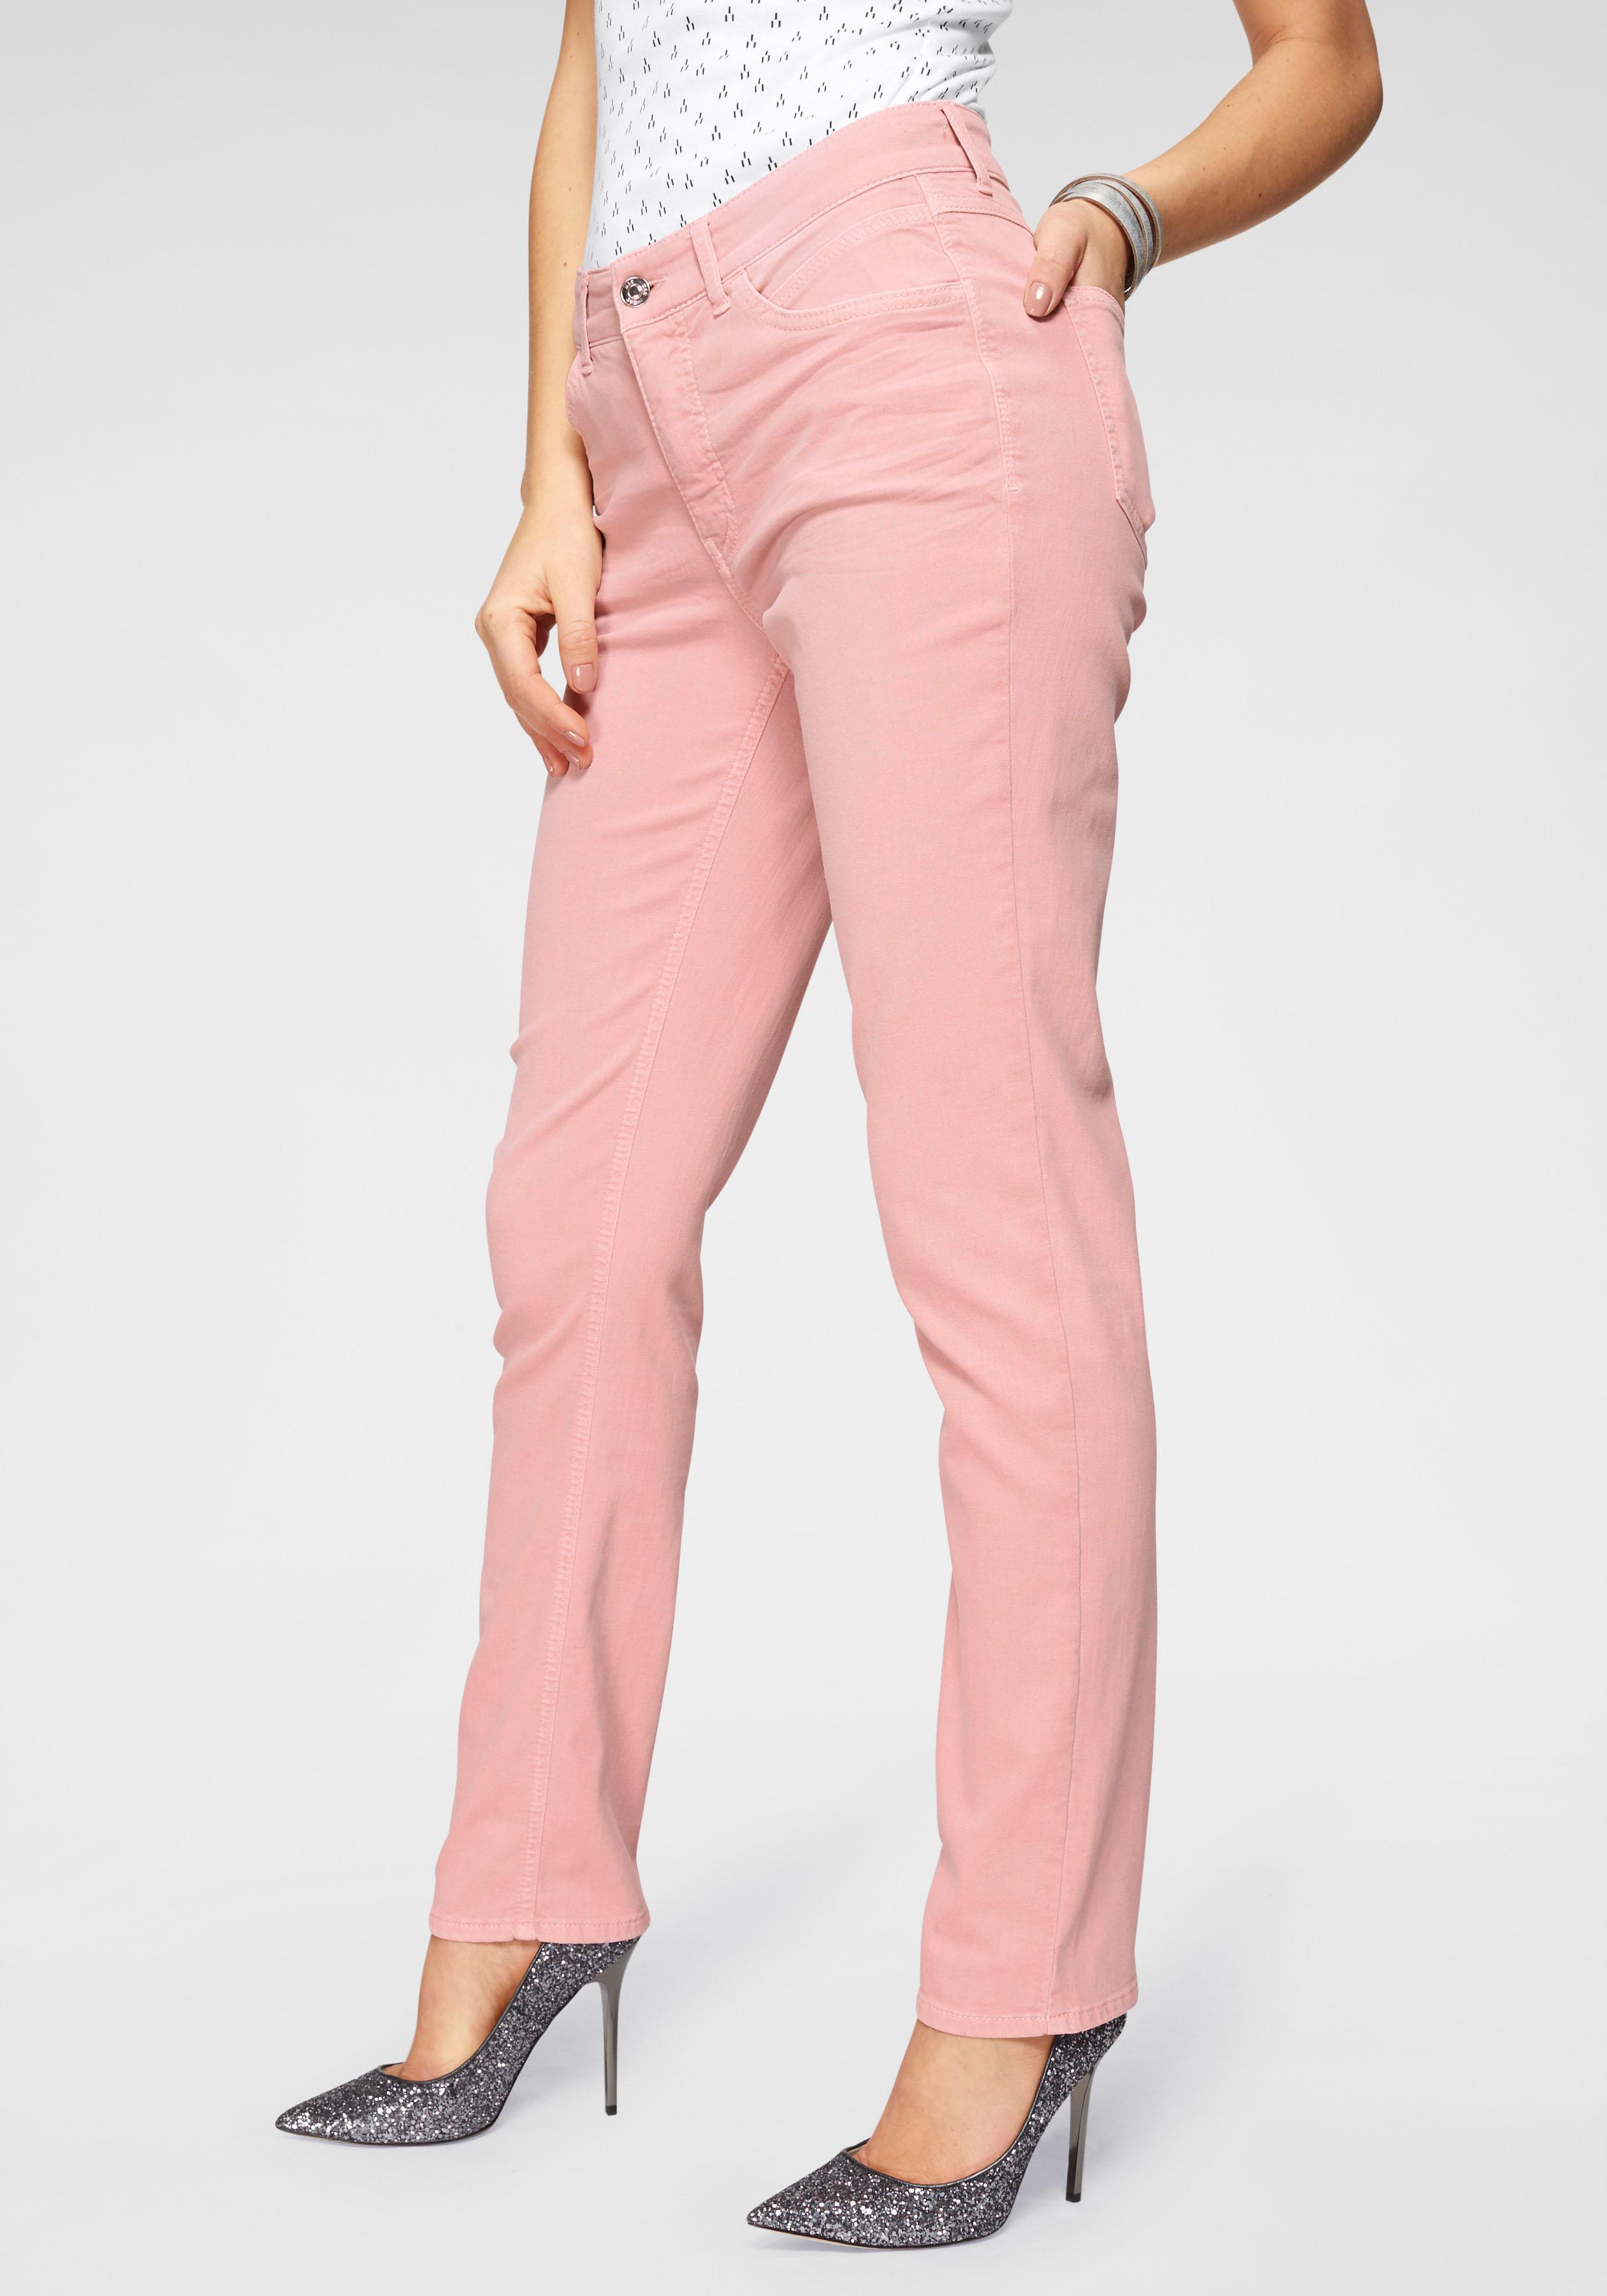 MAC 5-Pocket-Jeans Melanie   Bekleidung > Jeans > 5-Pocket-Jeans   Rosa   Mac